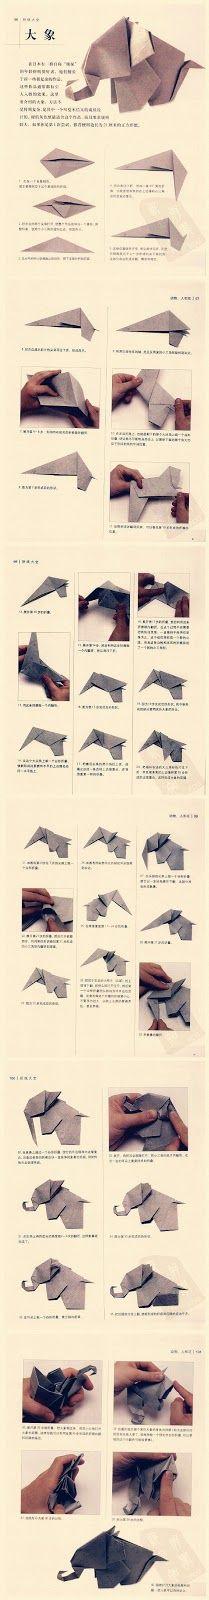 Tutorial paso a paso para hacer un elefante de origami o papiroflexia.